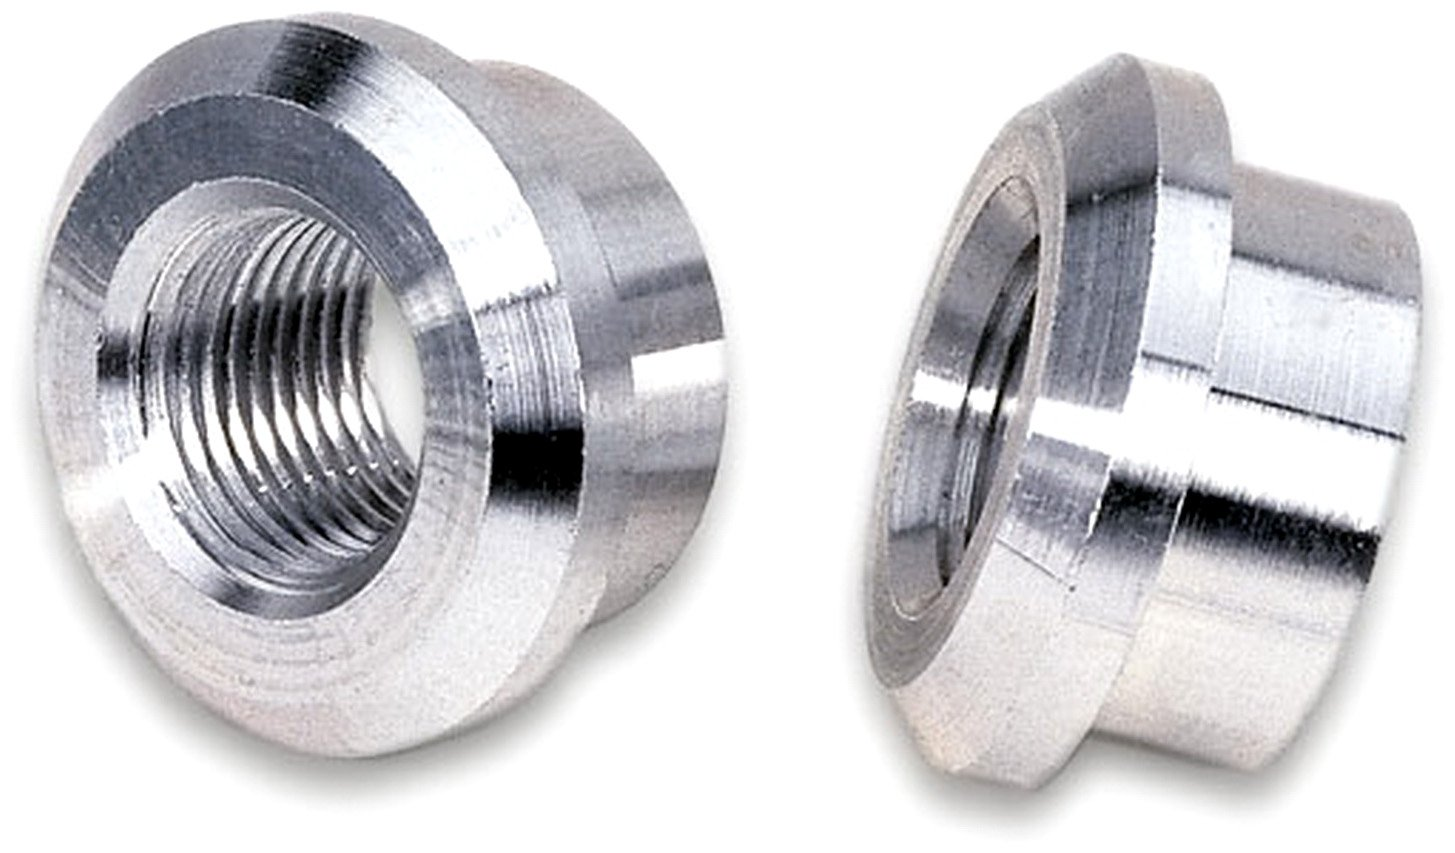 Moroso 68900 Aluminum Weld-In Bungs - Set of 2 KEYU1